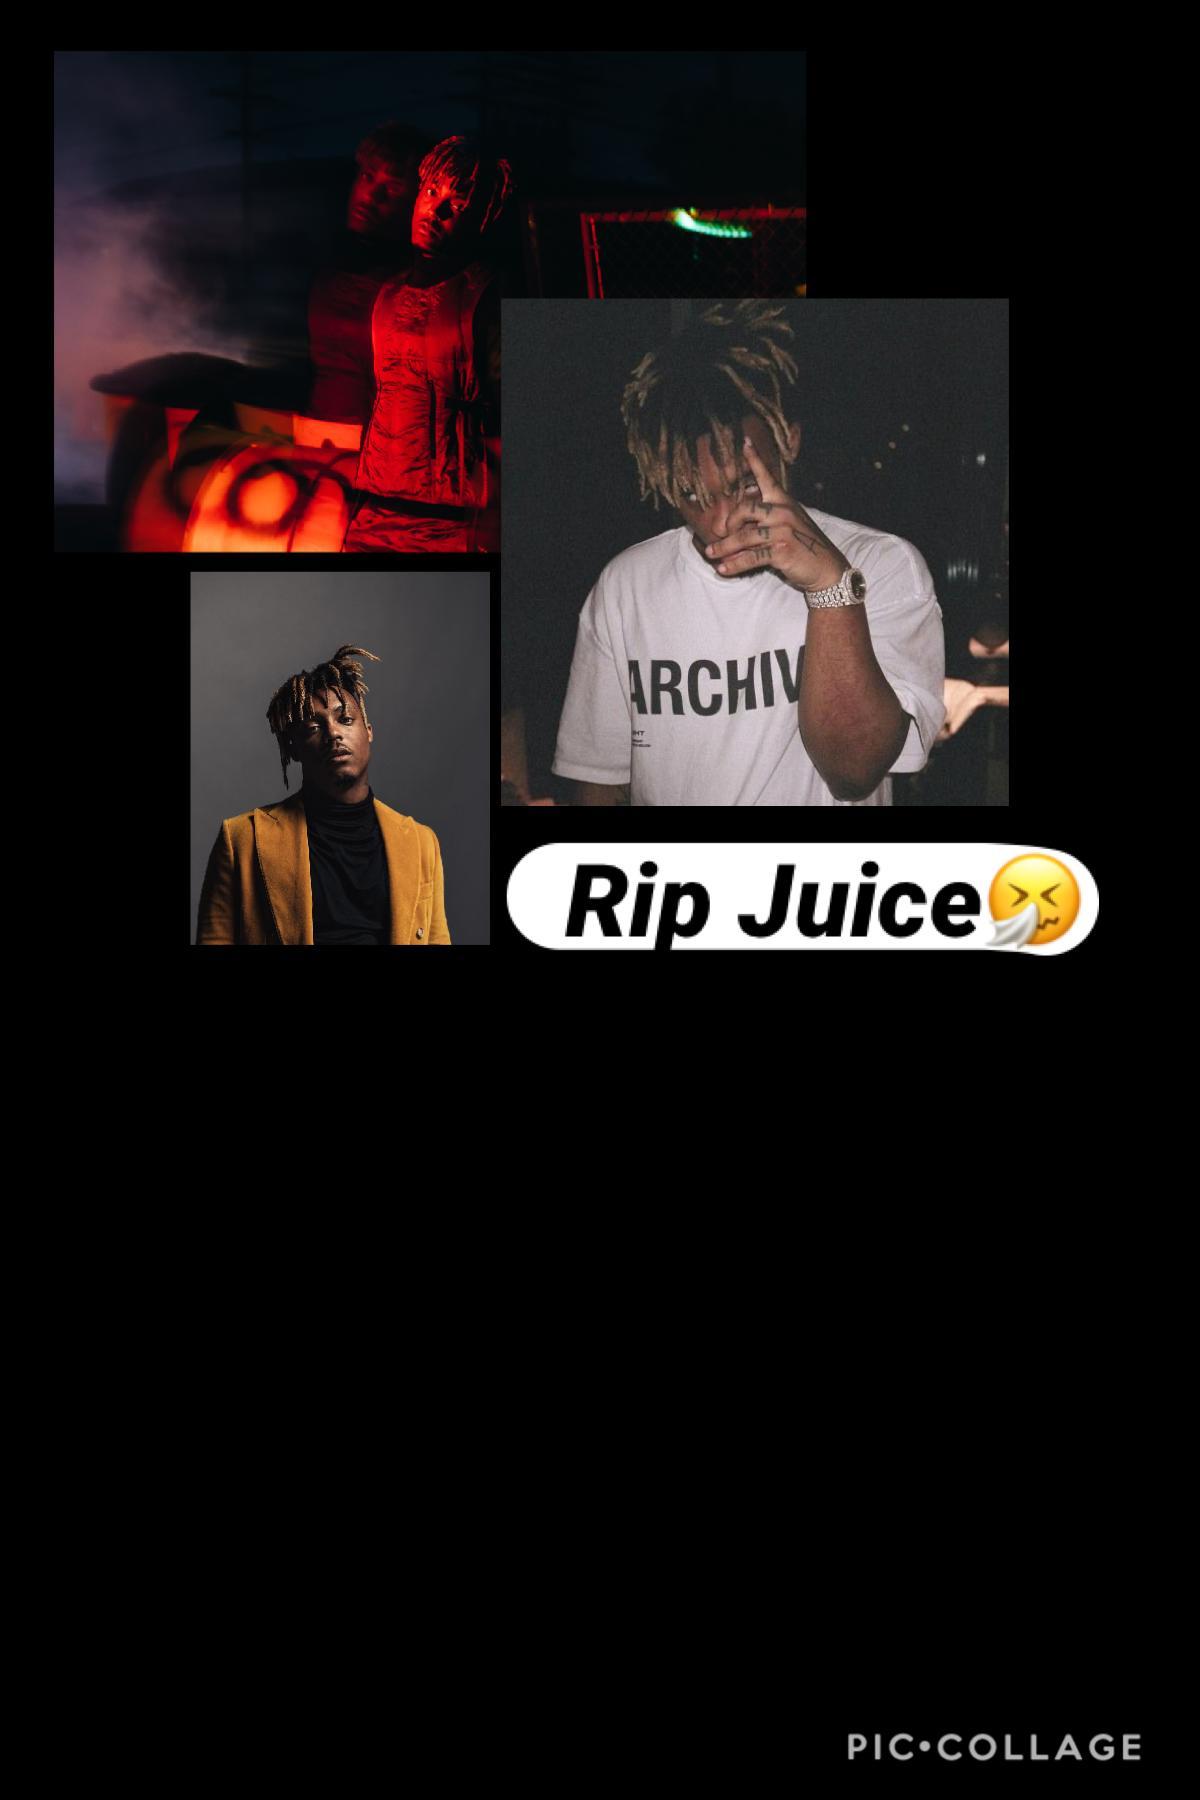 Miss you juice 😭